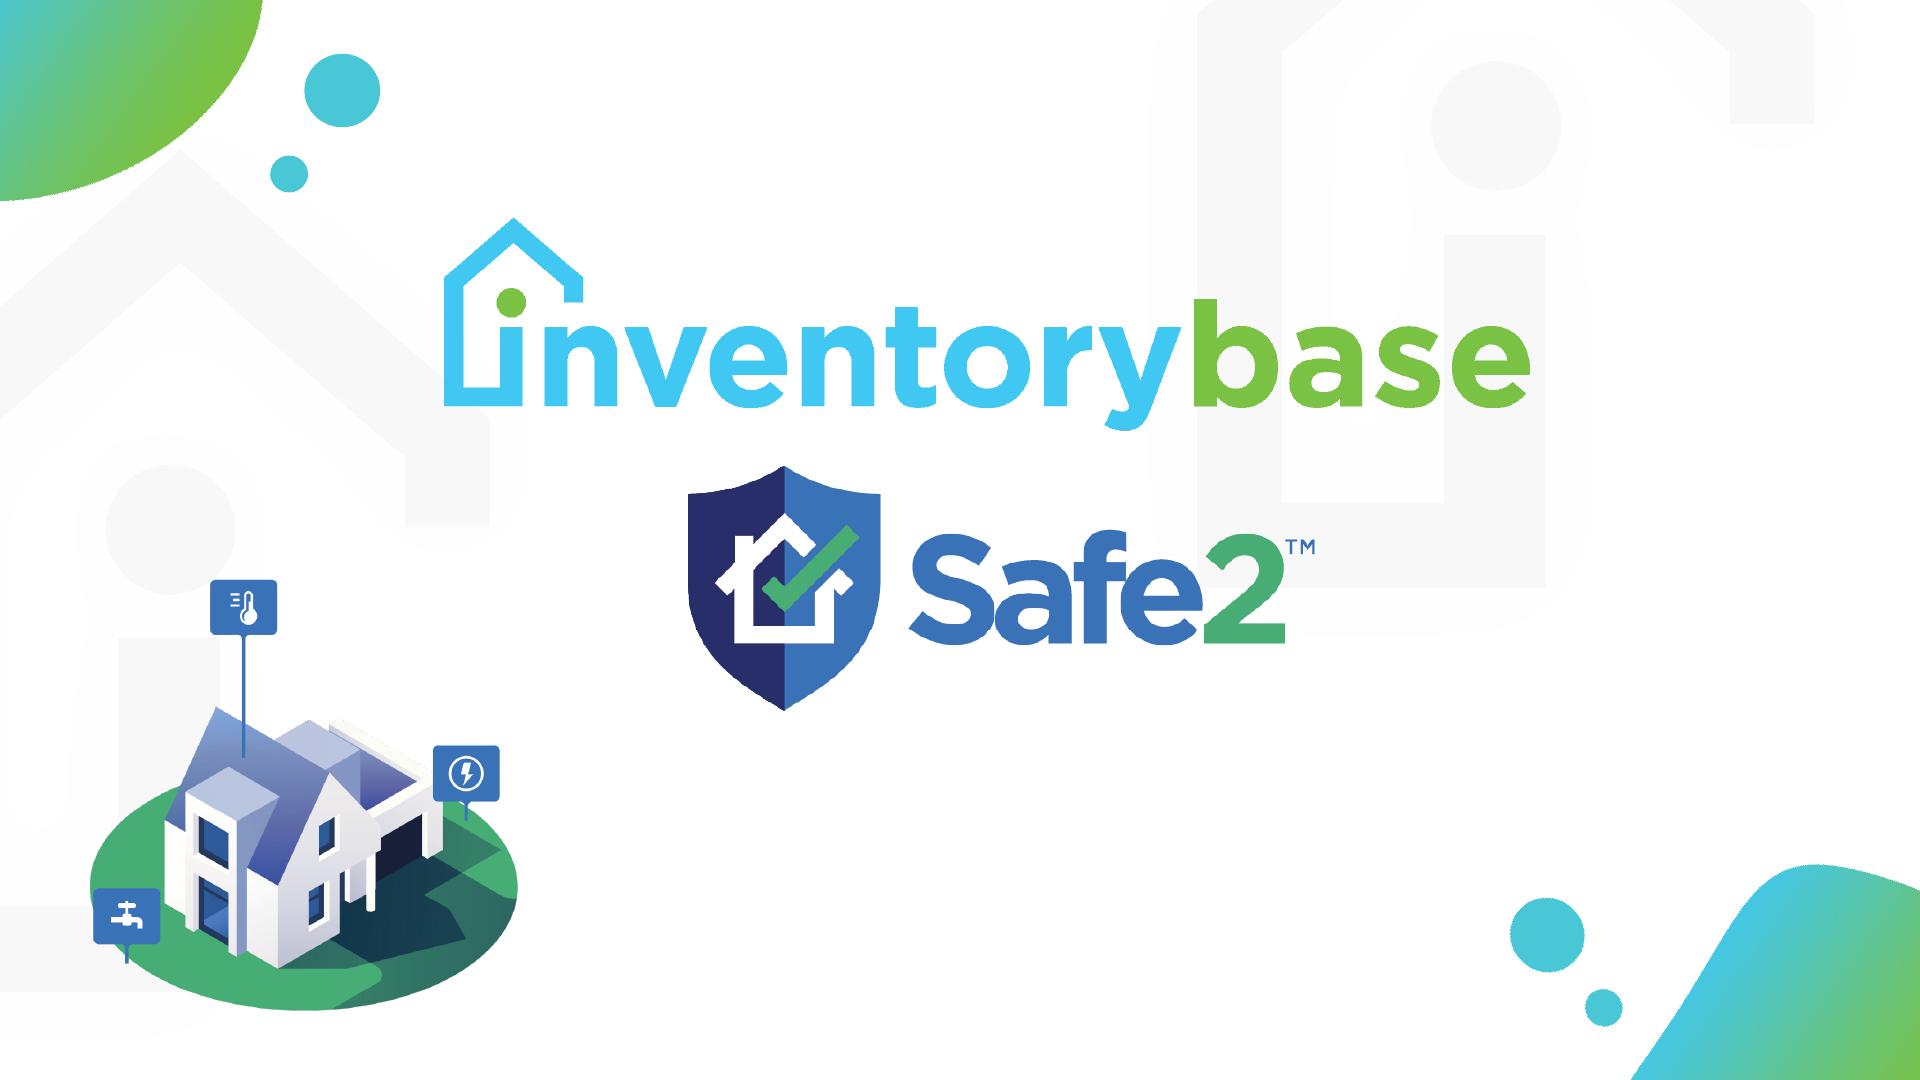 InventoryBase announces partnership with Safe2